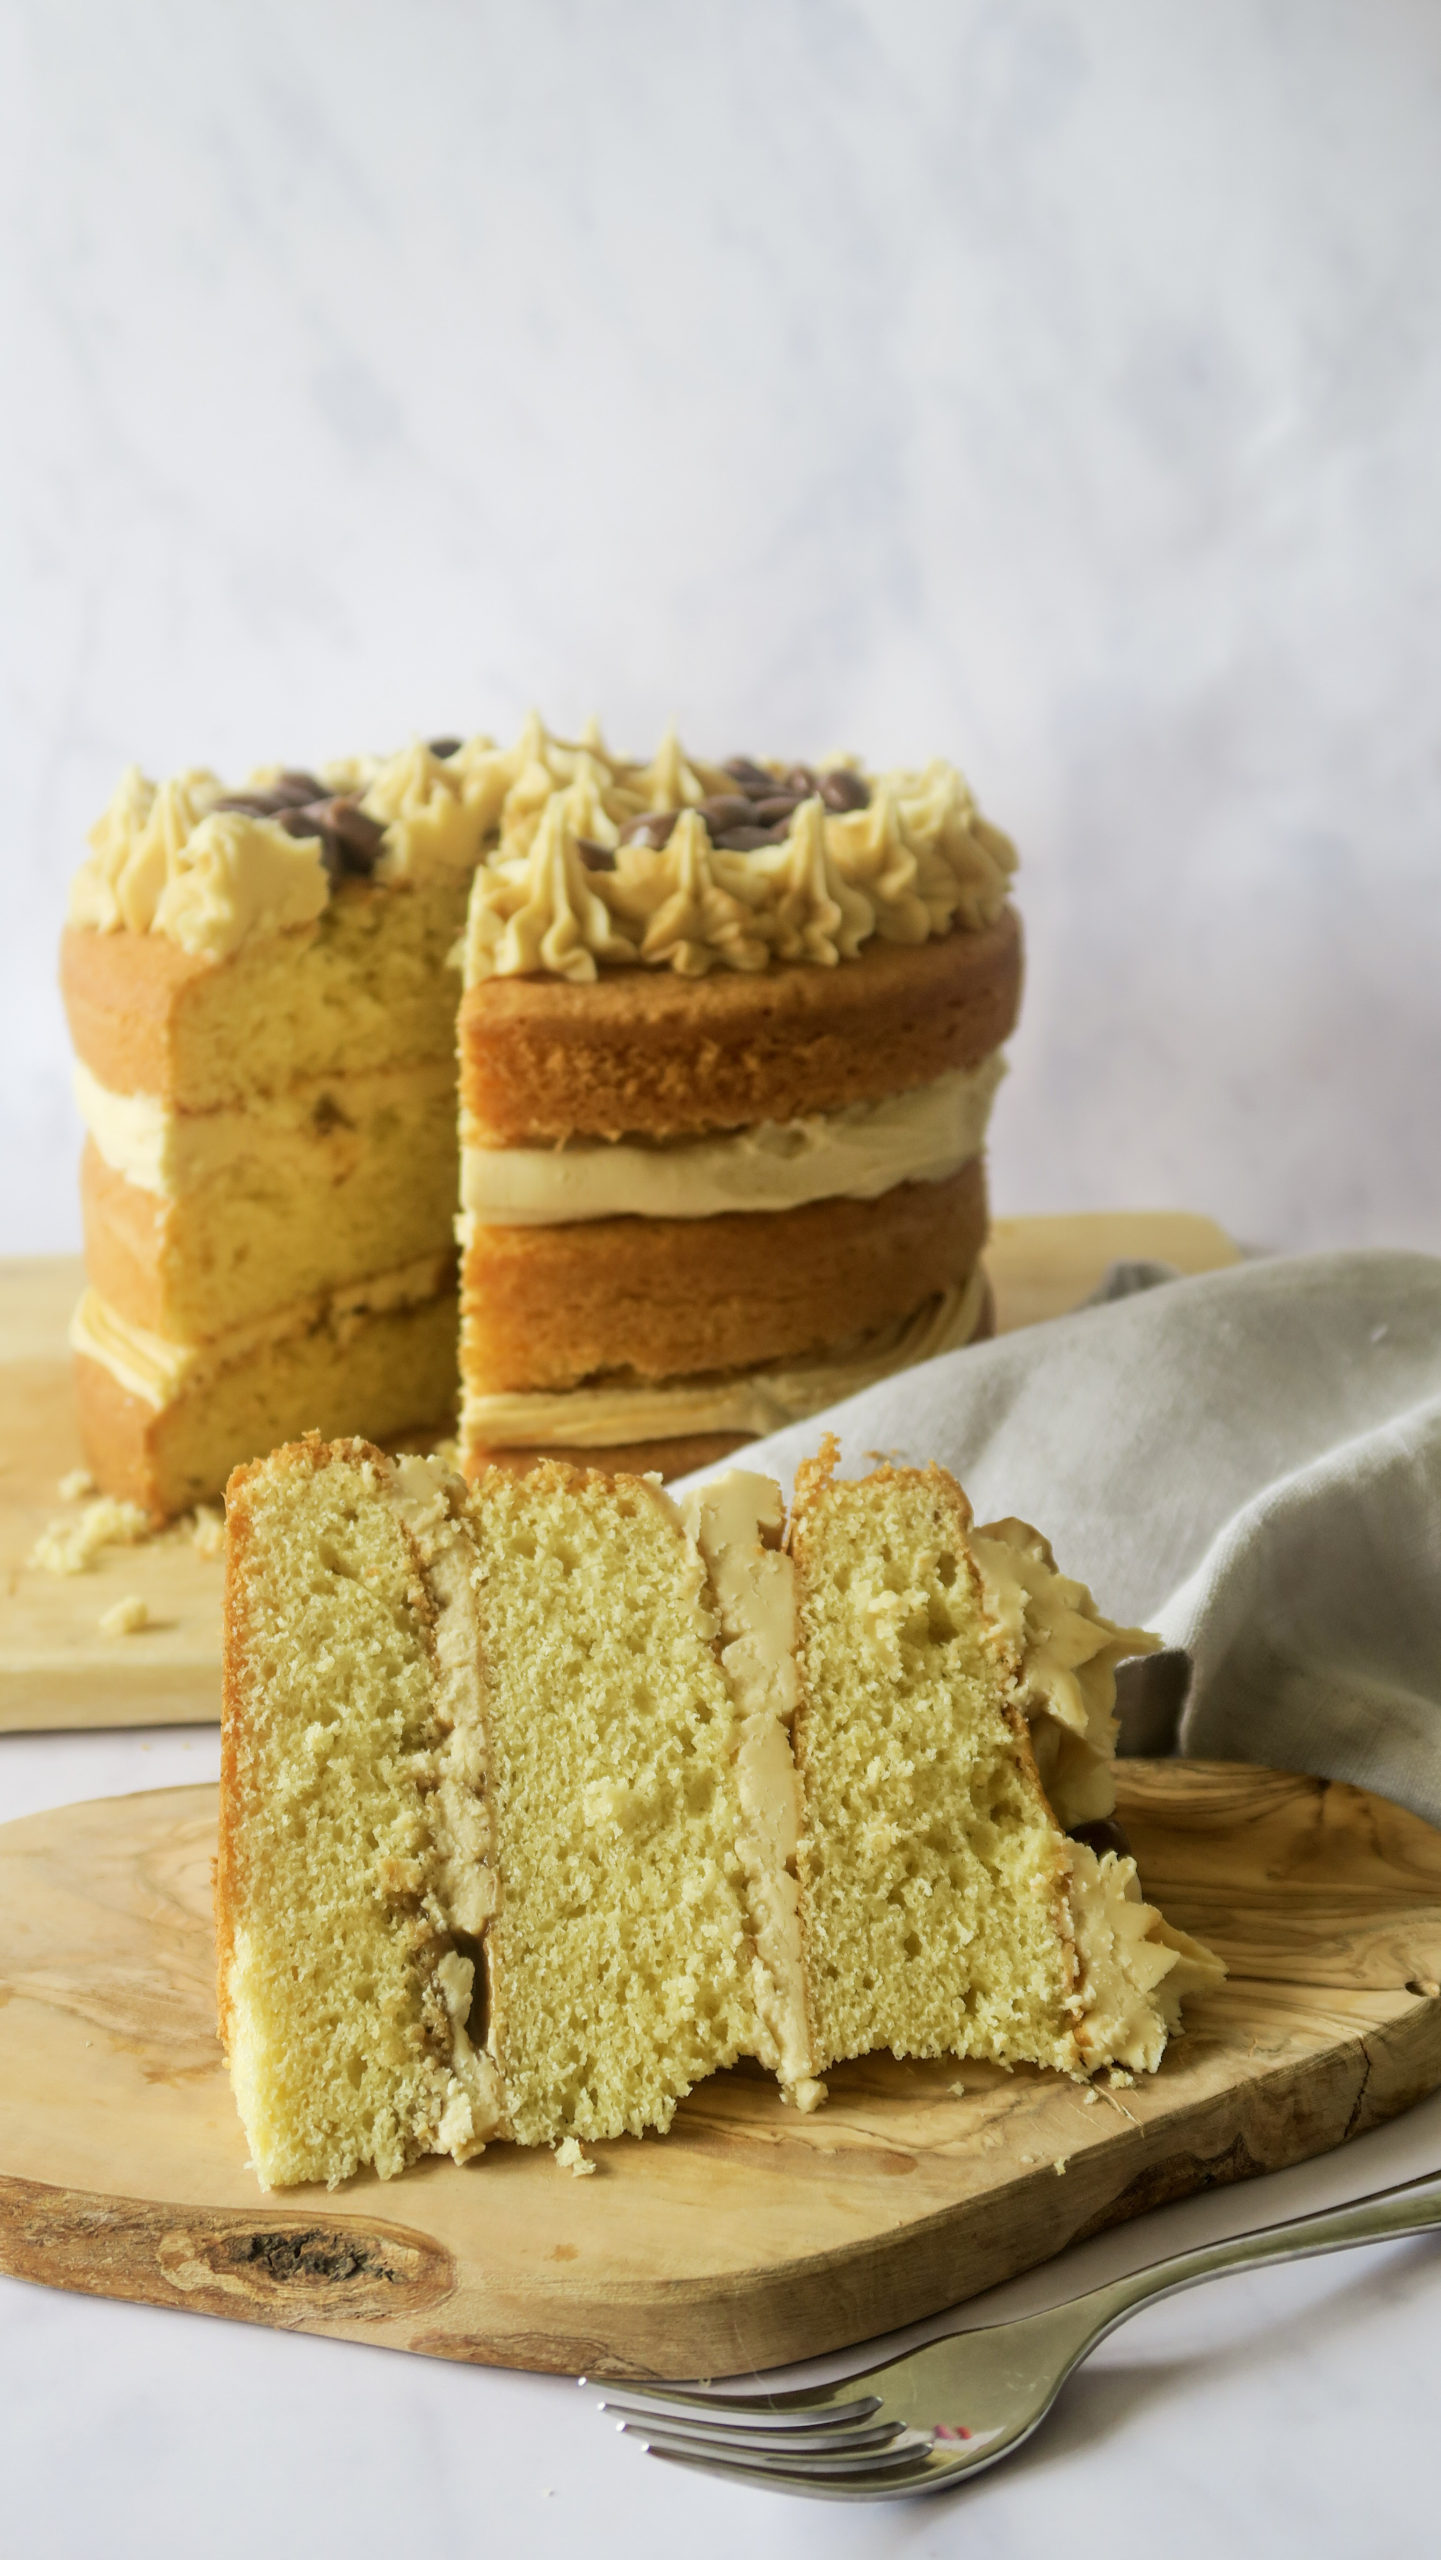 Dulce de Leche Cake with Milkduds